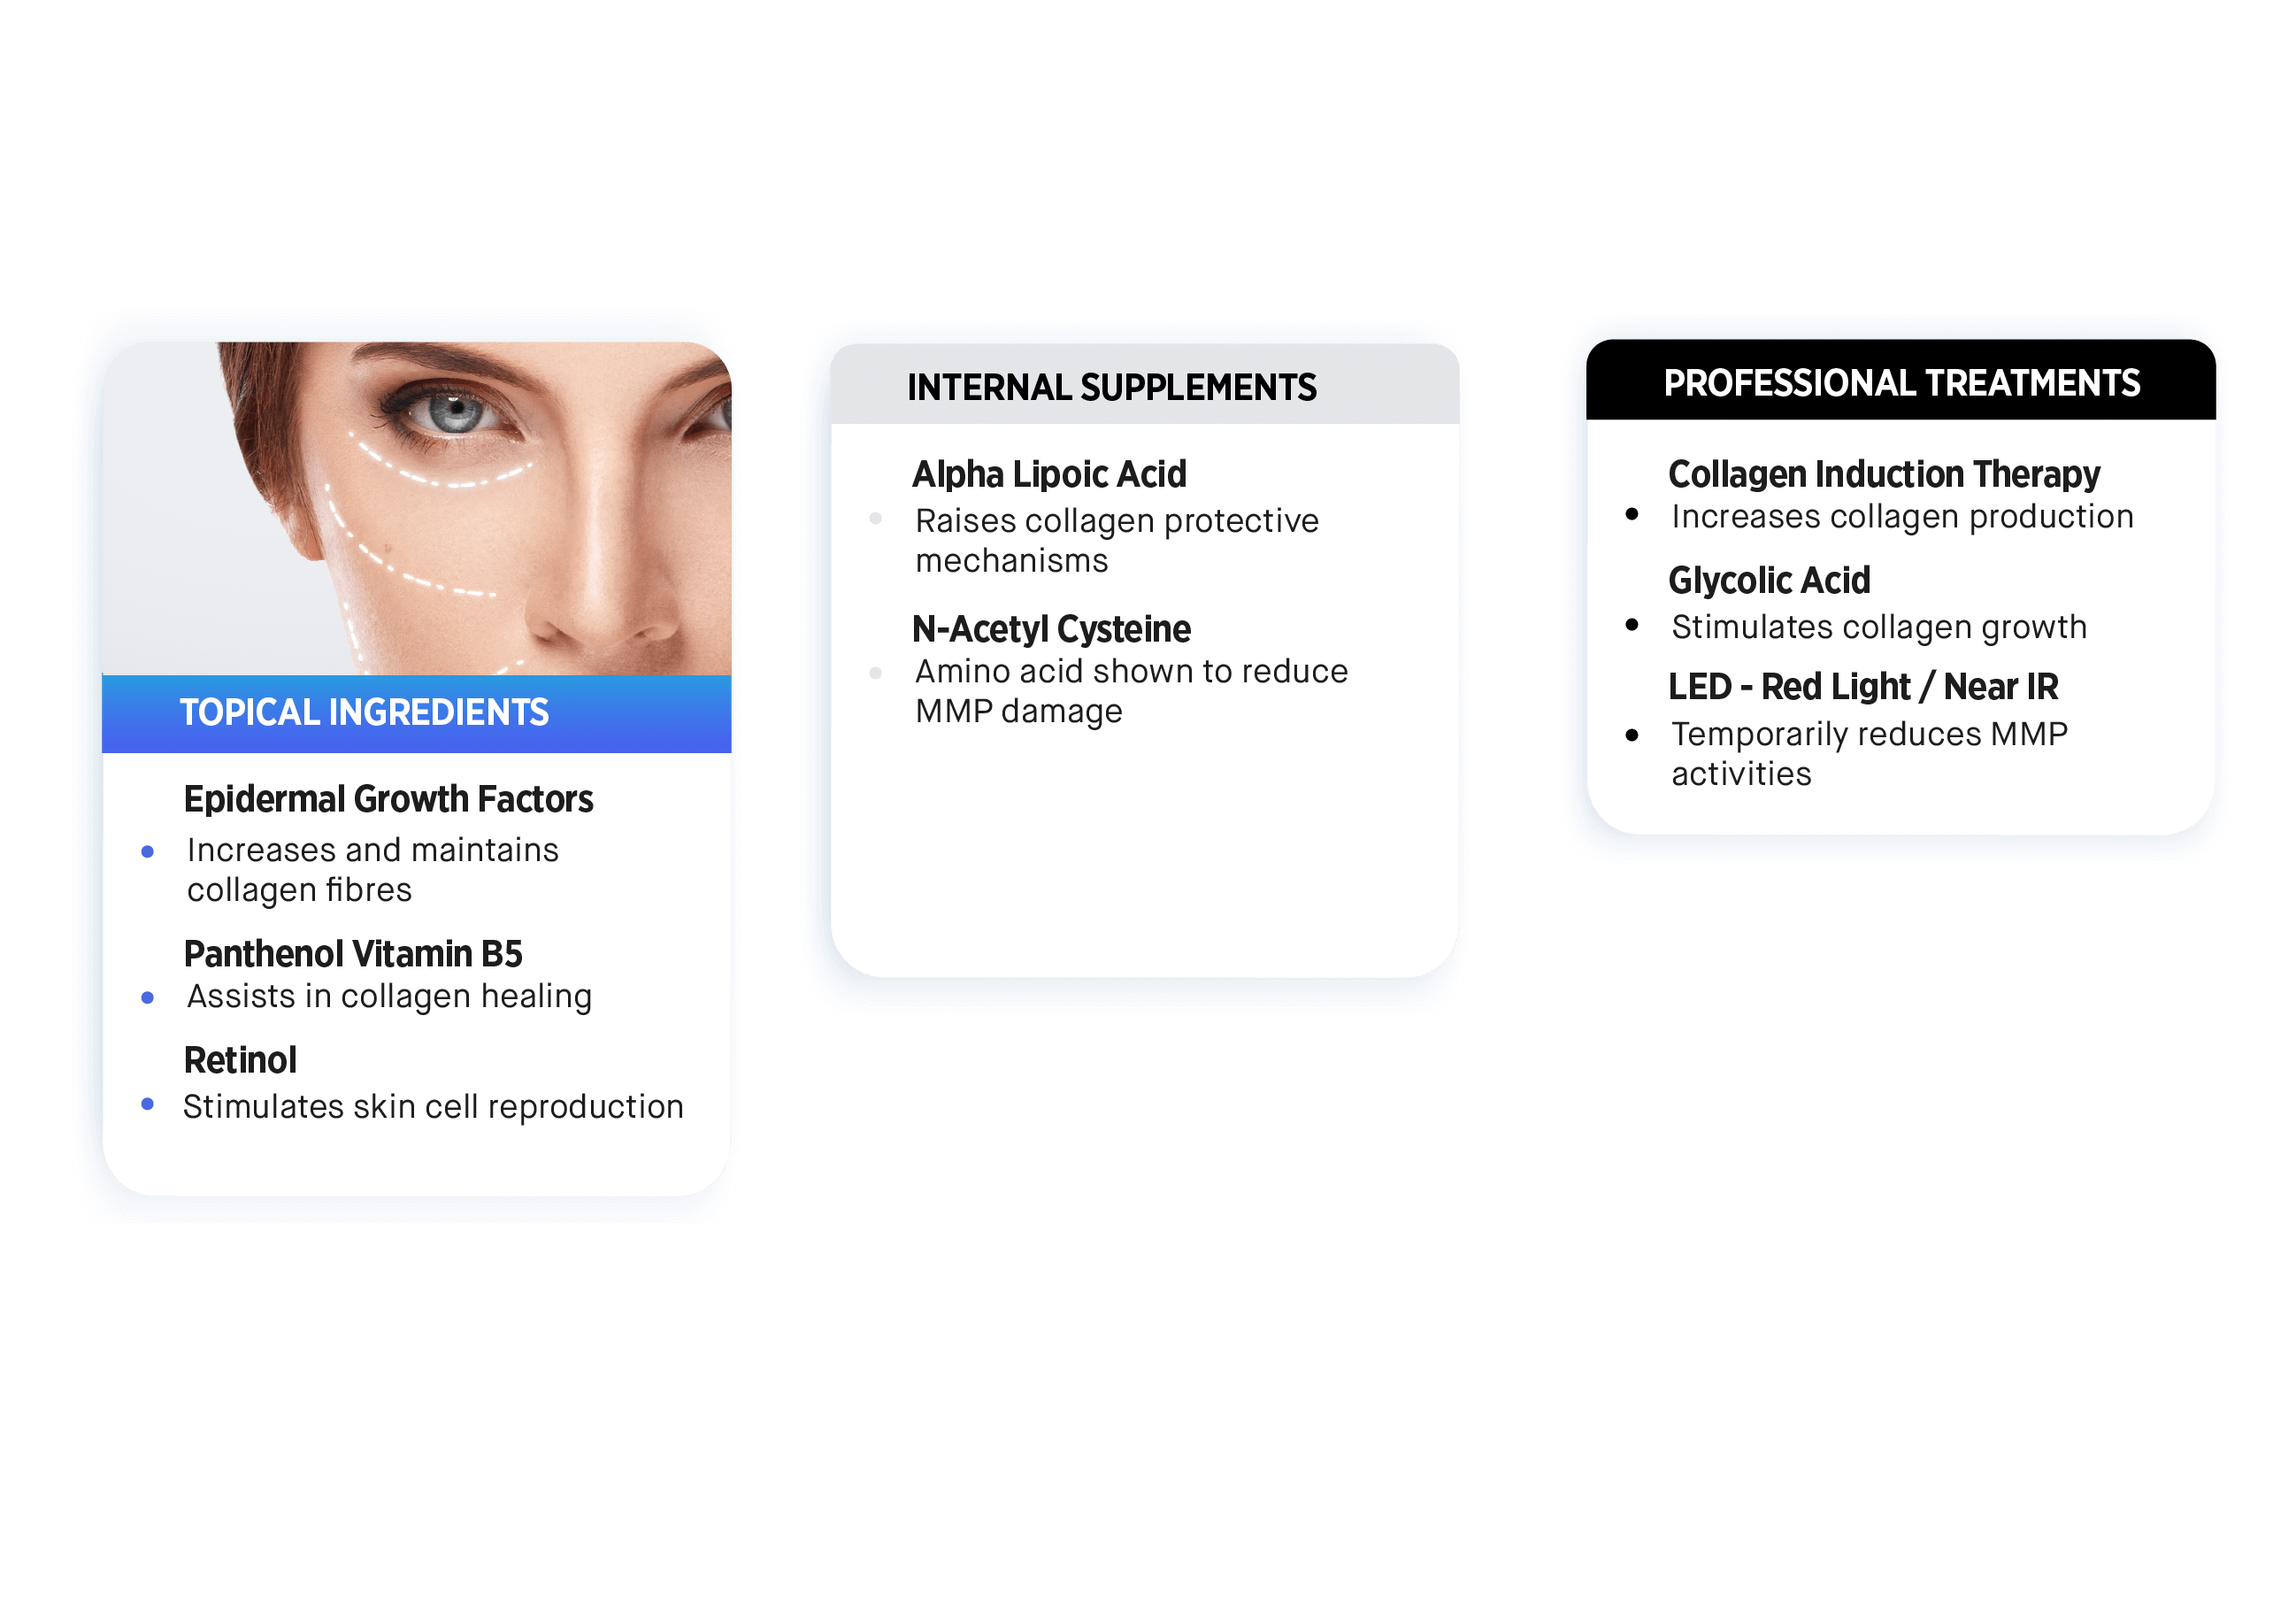 SkinDNA Ingredient Recommendations Snapshot